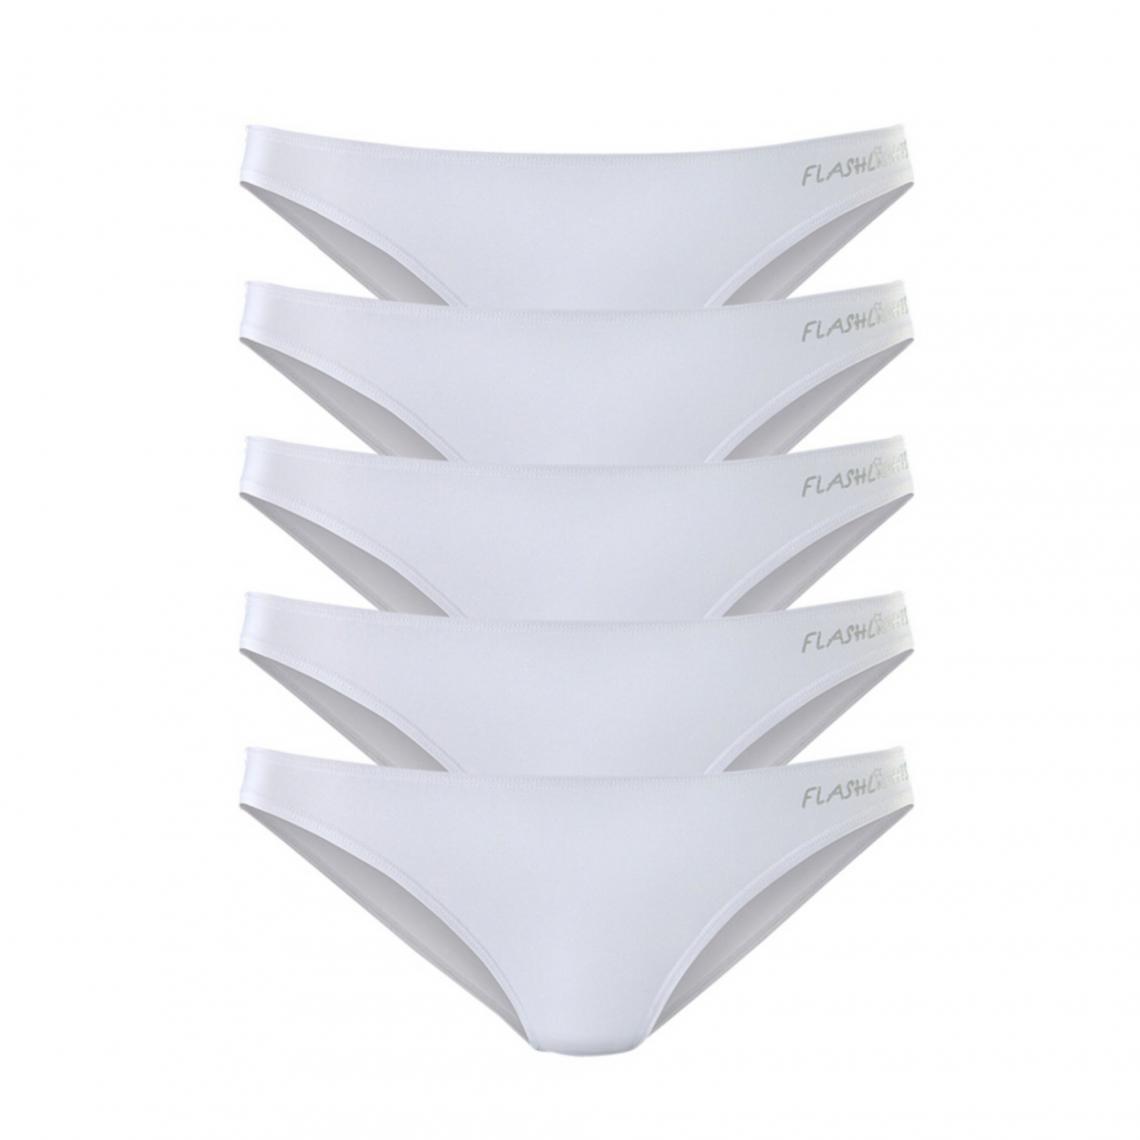 Lot de 5 slips femme Flashlights - Blanc  142900b4cff